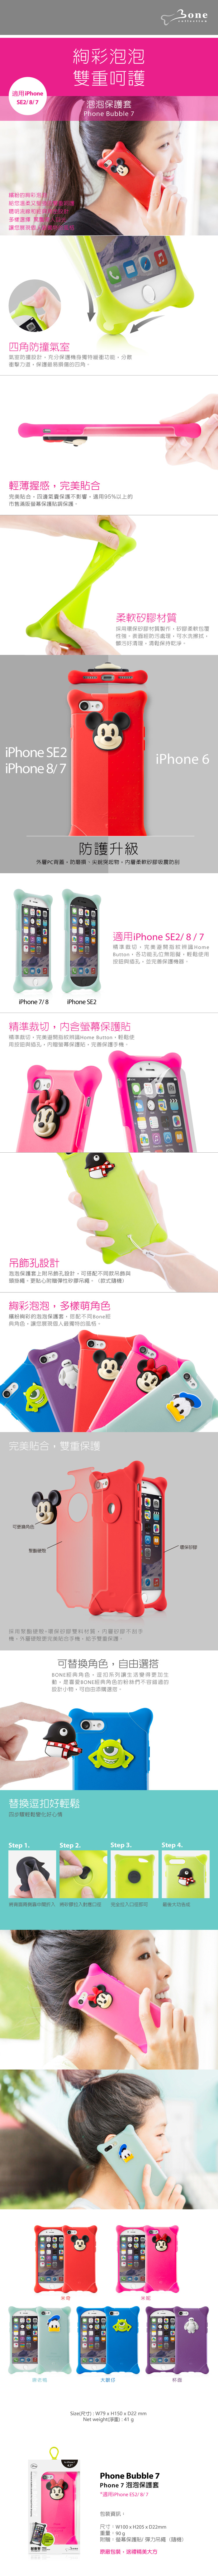 Bone|iPhone SE2 / 8 / 7 四角防撞 泡泡保護套 - 杯麵